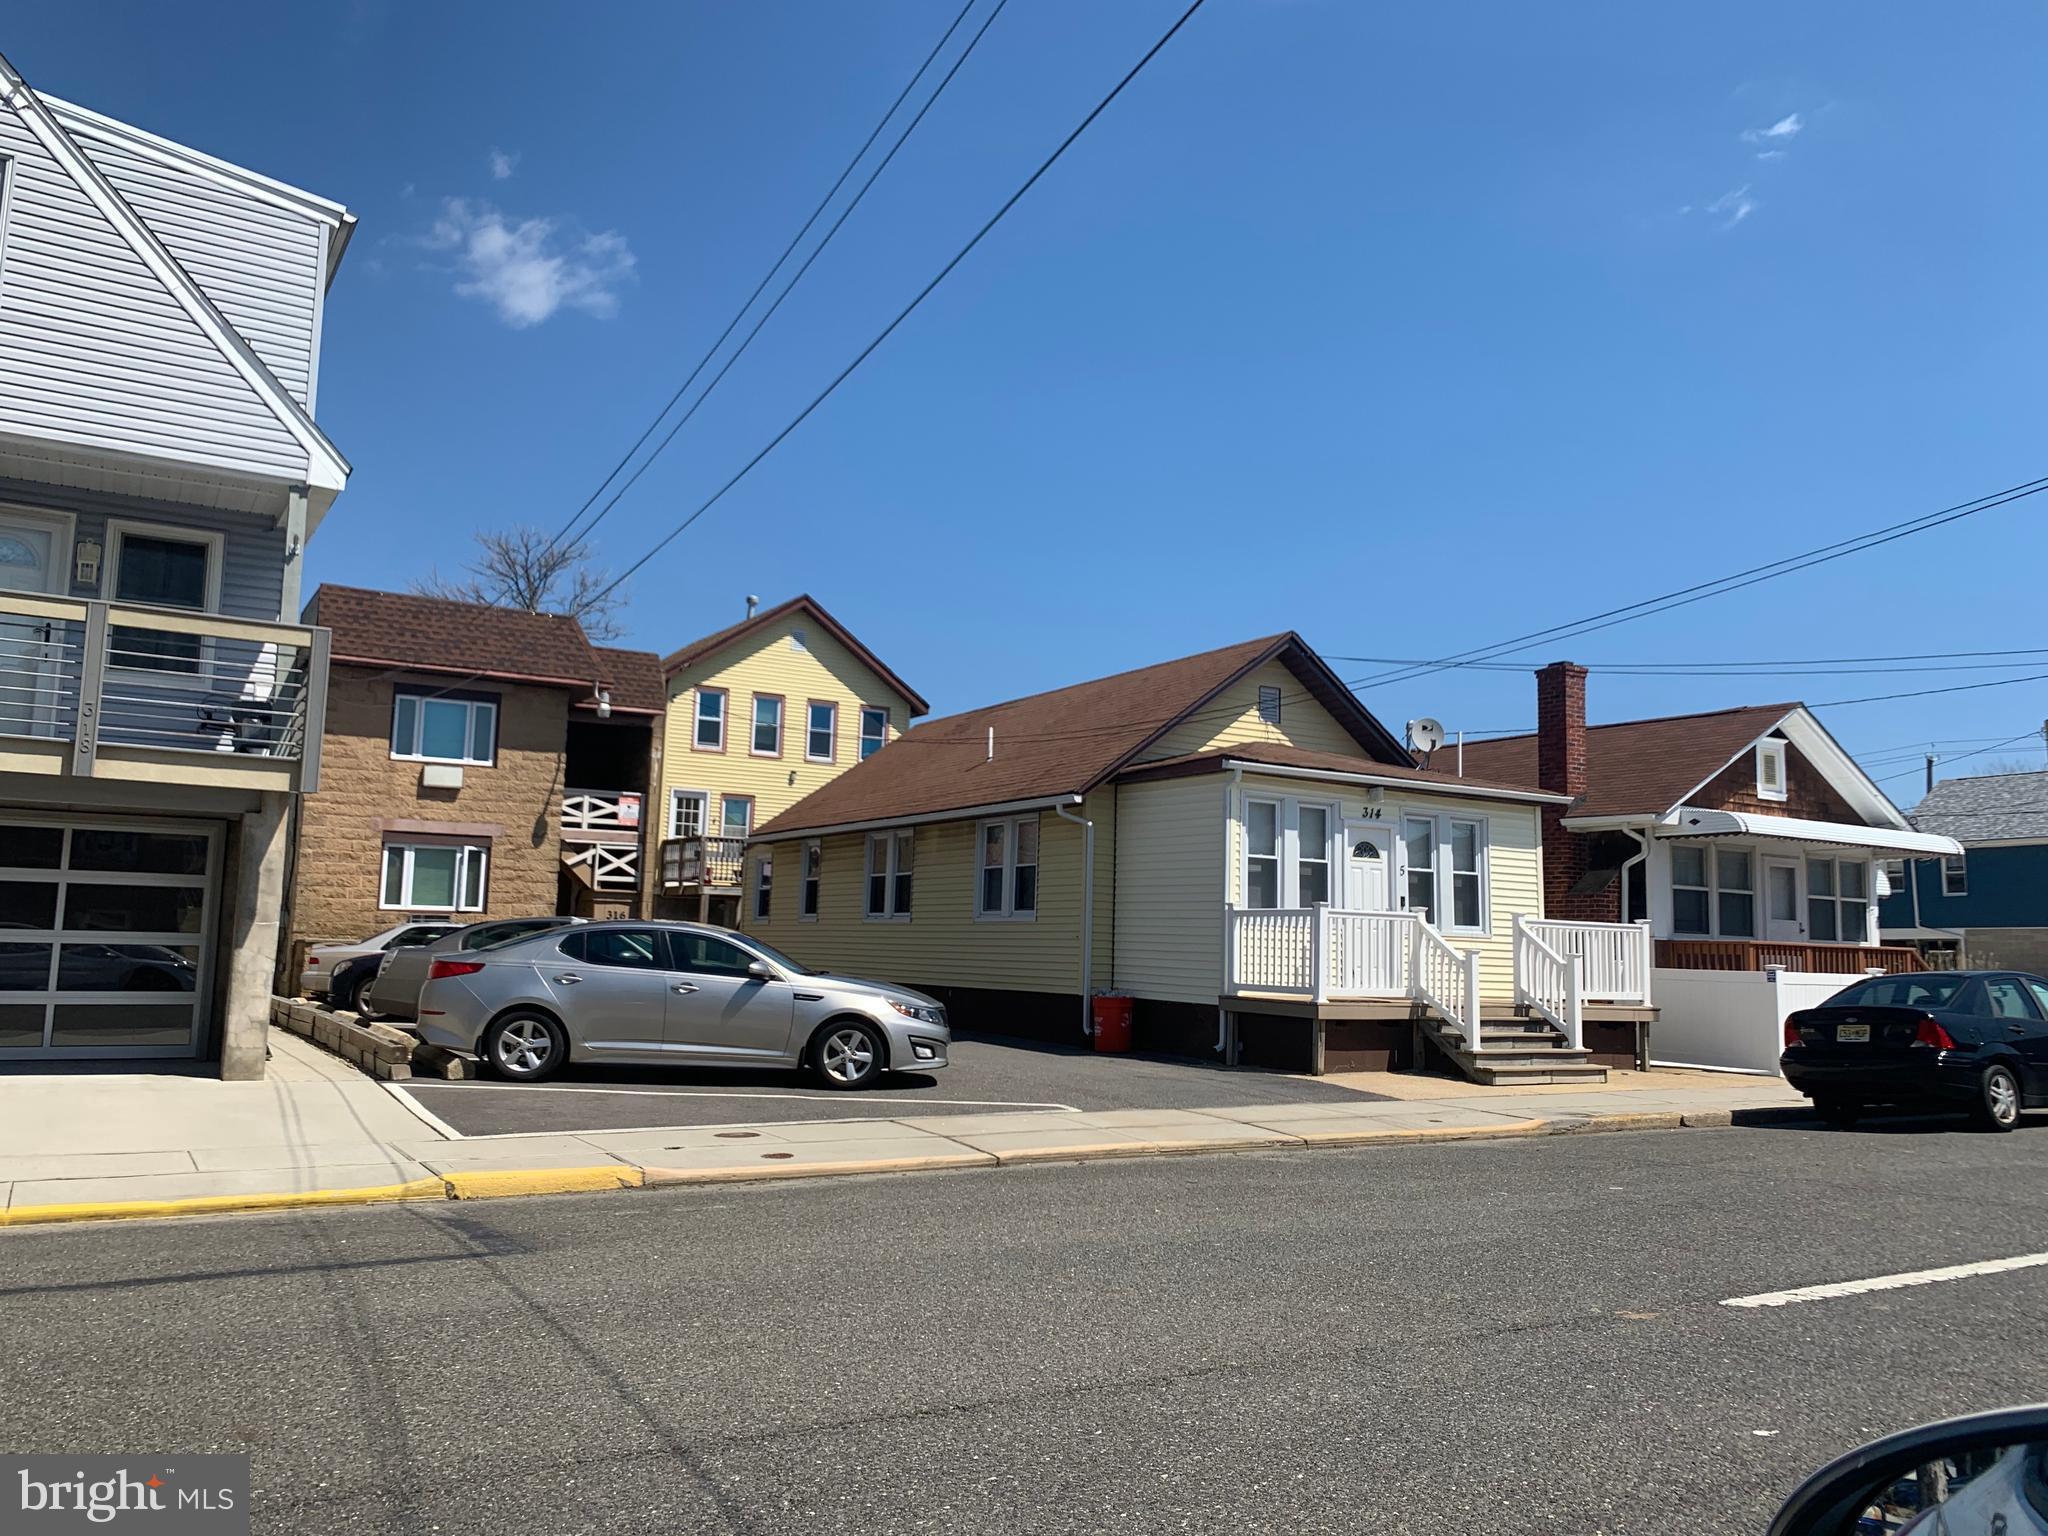 0 Sumner Avenue, Seaside Heights, NJ 08751